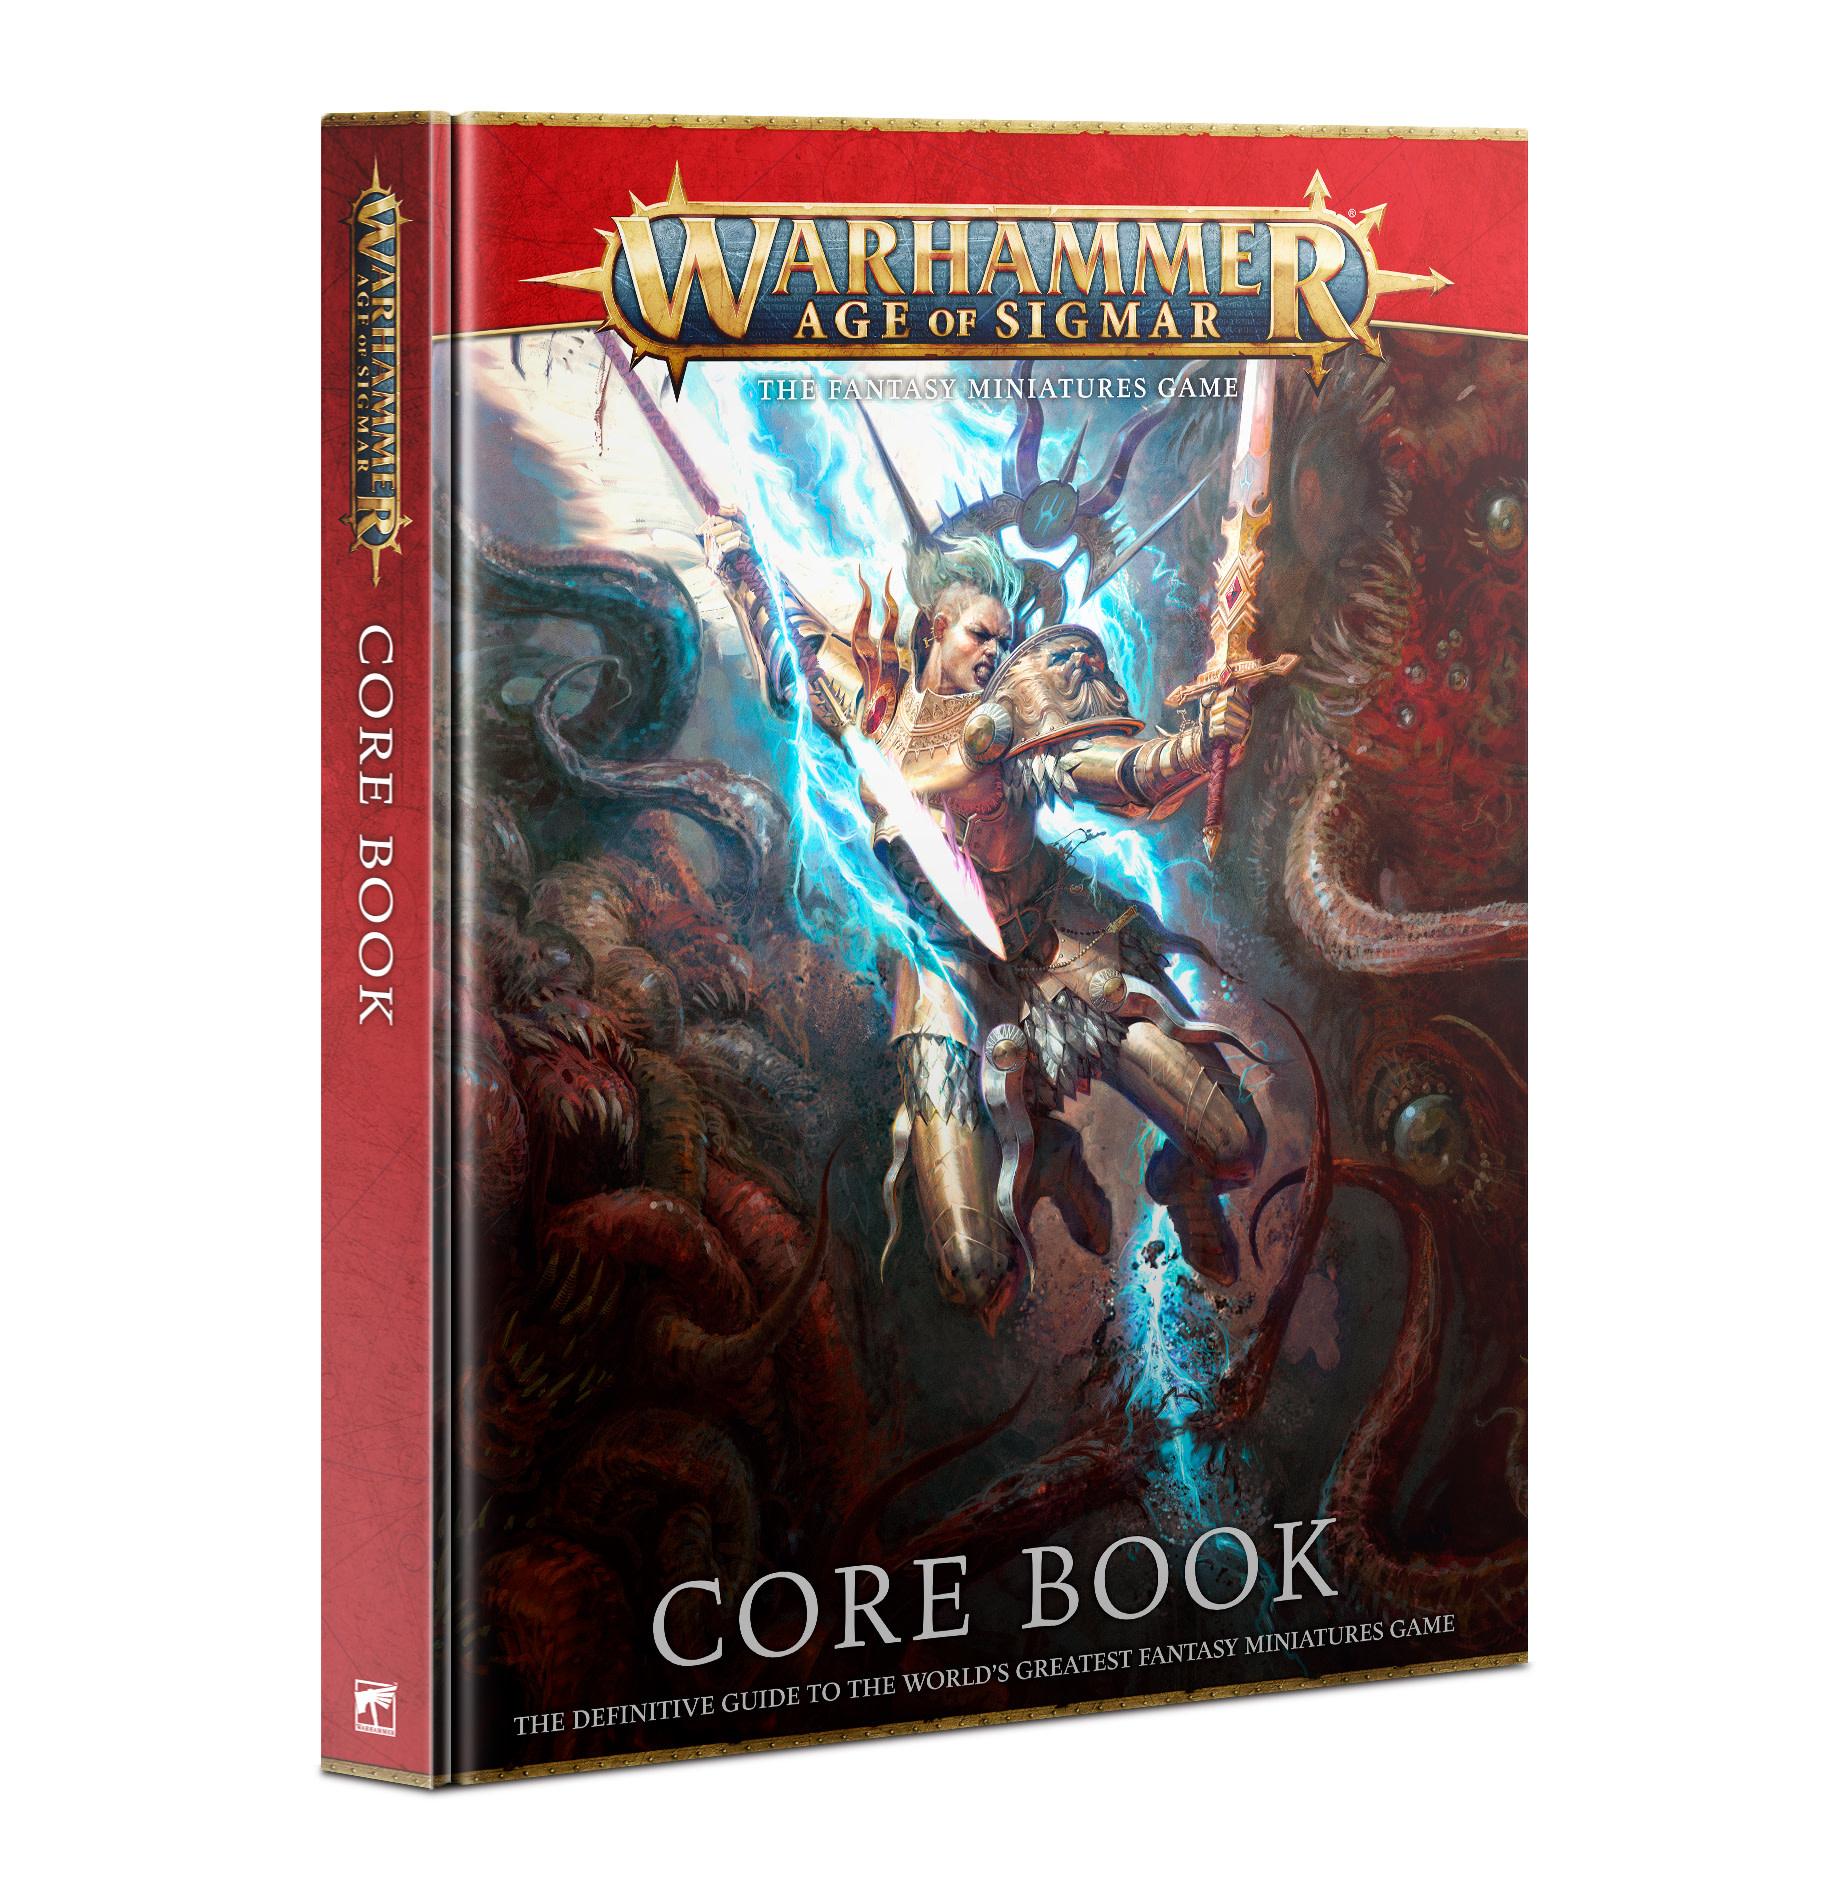 Games-Workshop Warhammer Age of Sigmar: Core Book